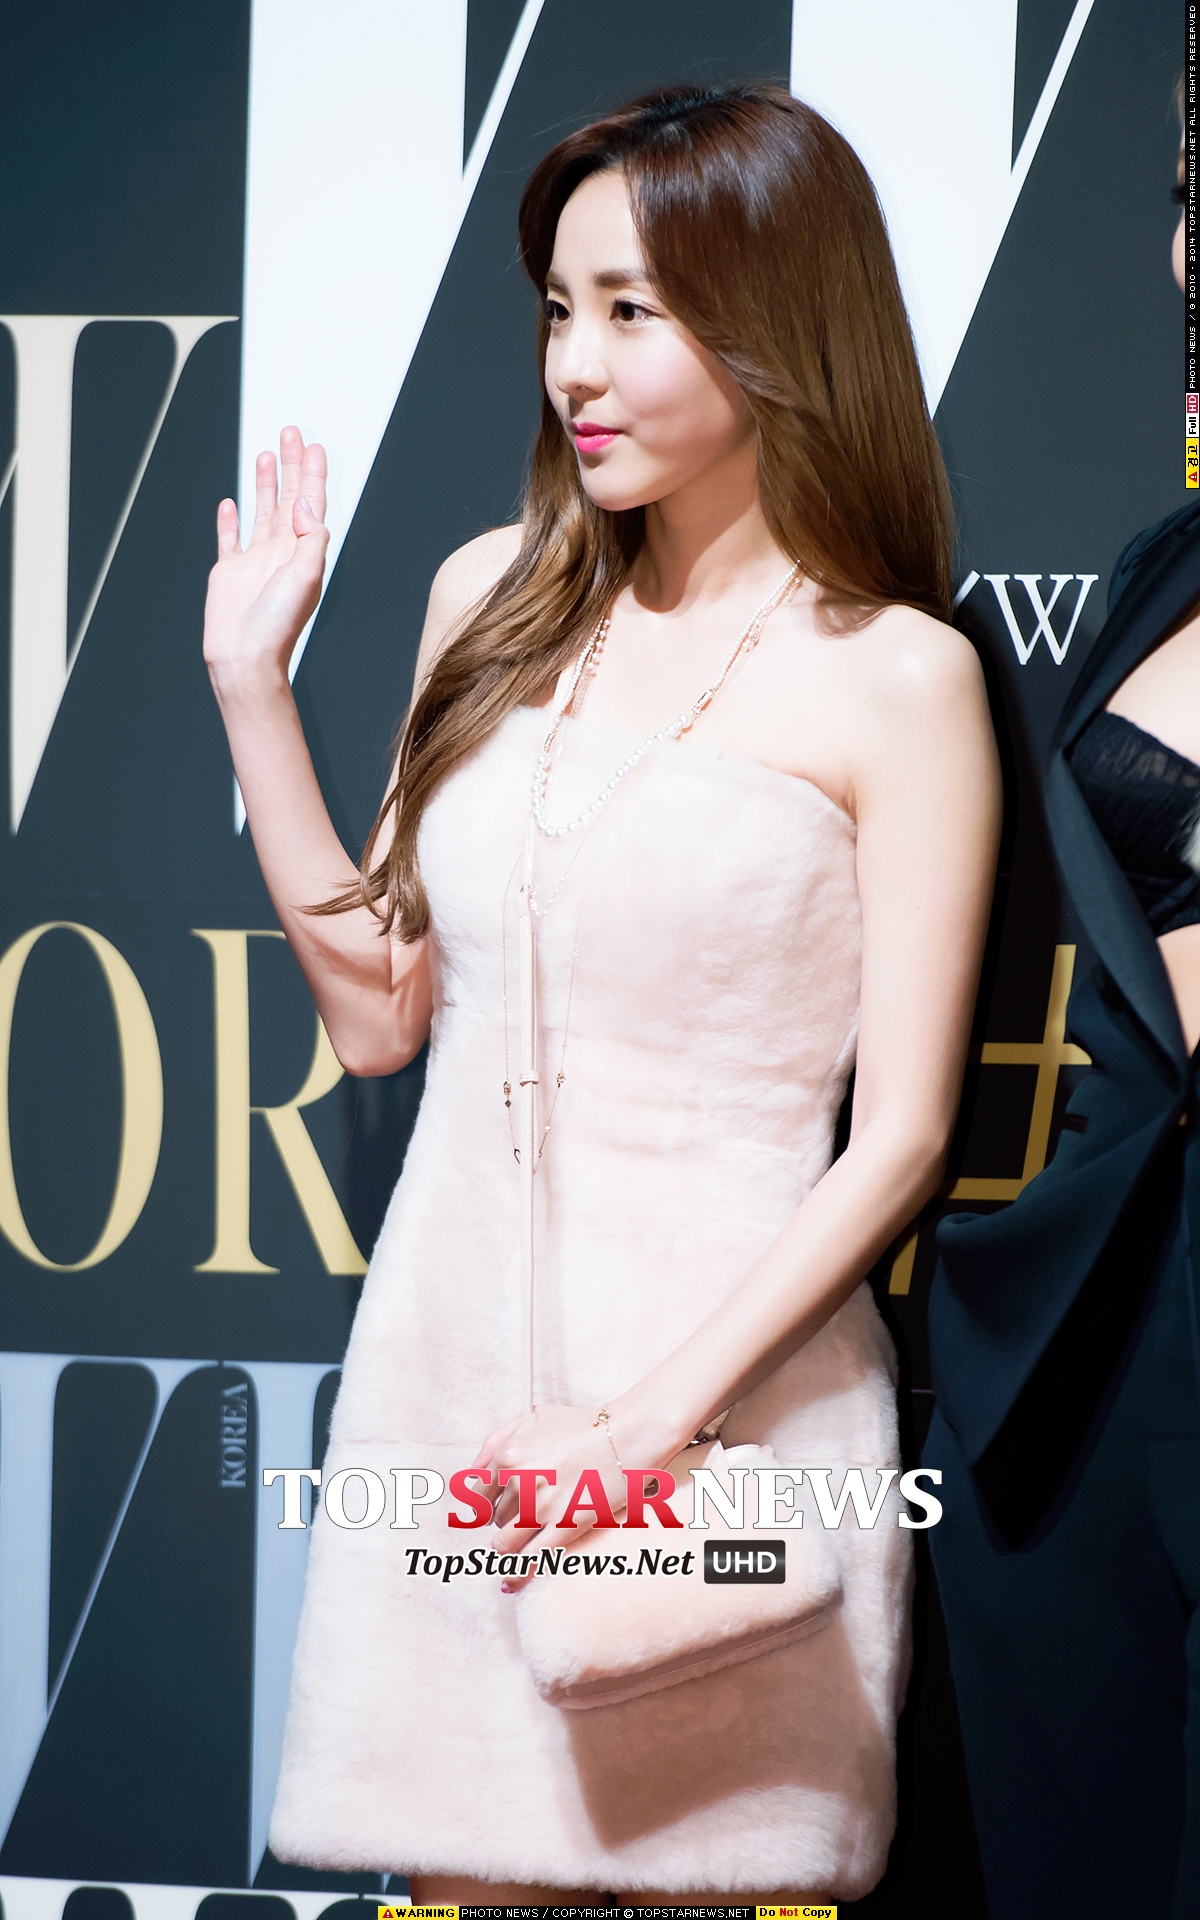 2NE1 Dara也來了!和CL做出截然不同的風格造型,粉嫩的春妝造型非常適合她。